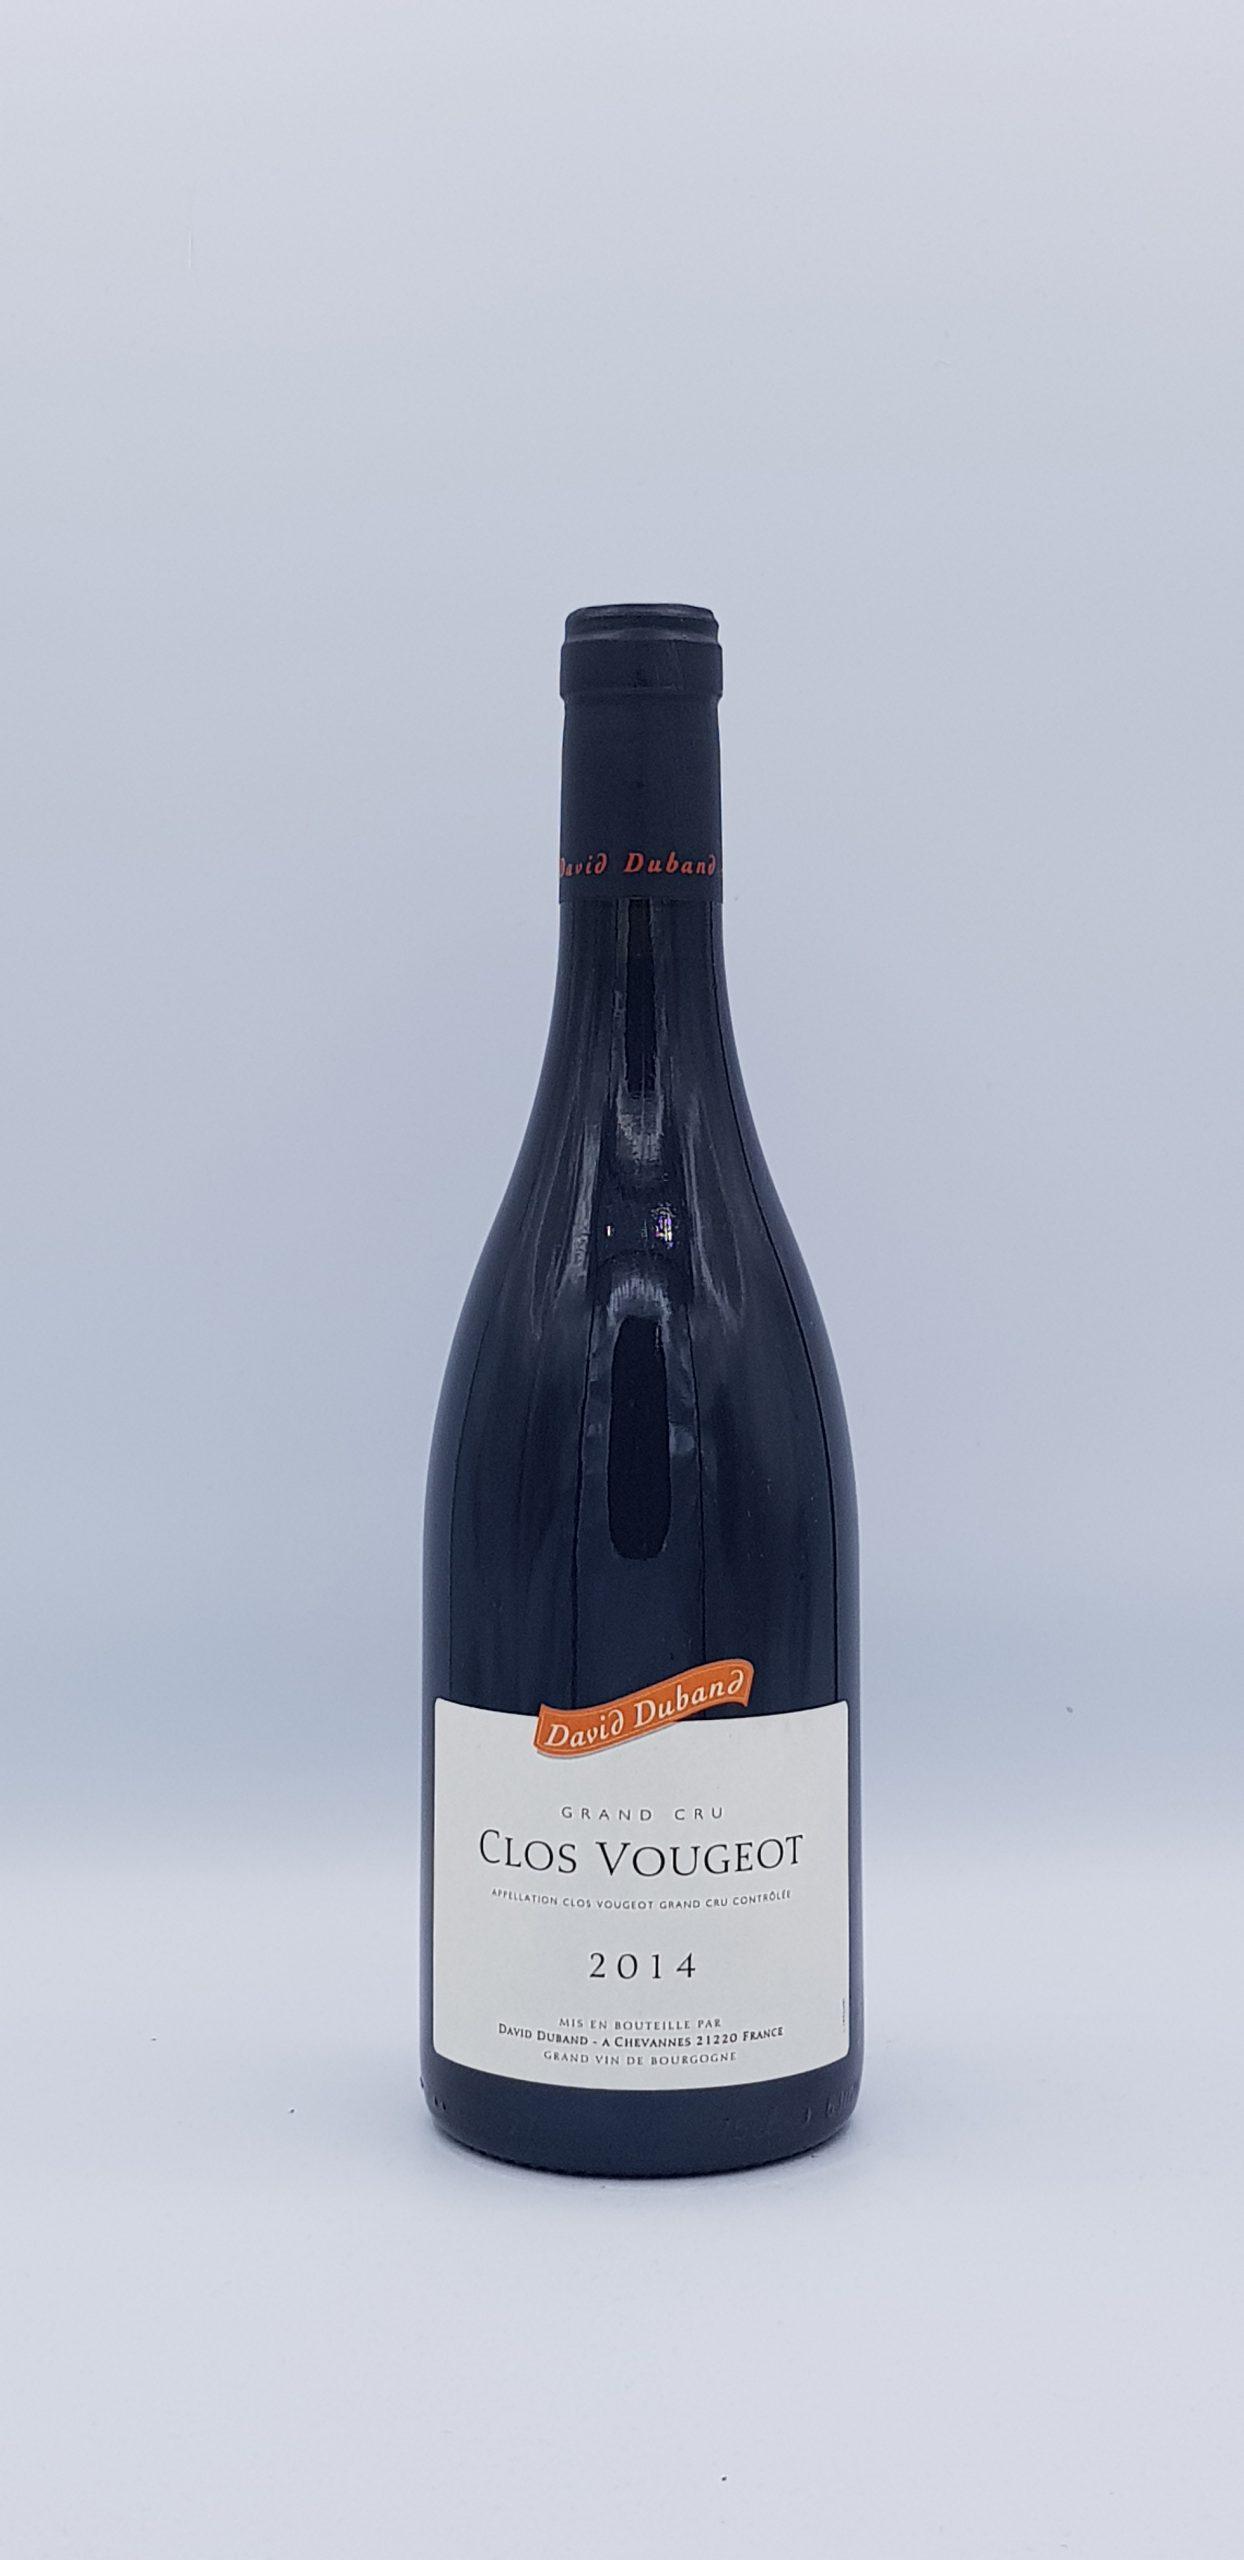 Clos Vougeot Grand Cru 2014